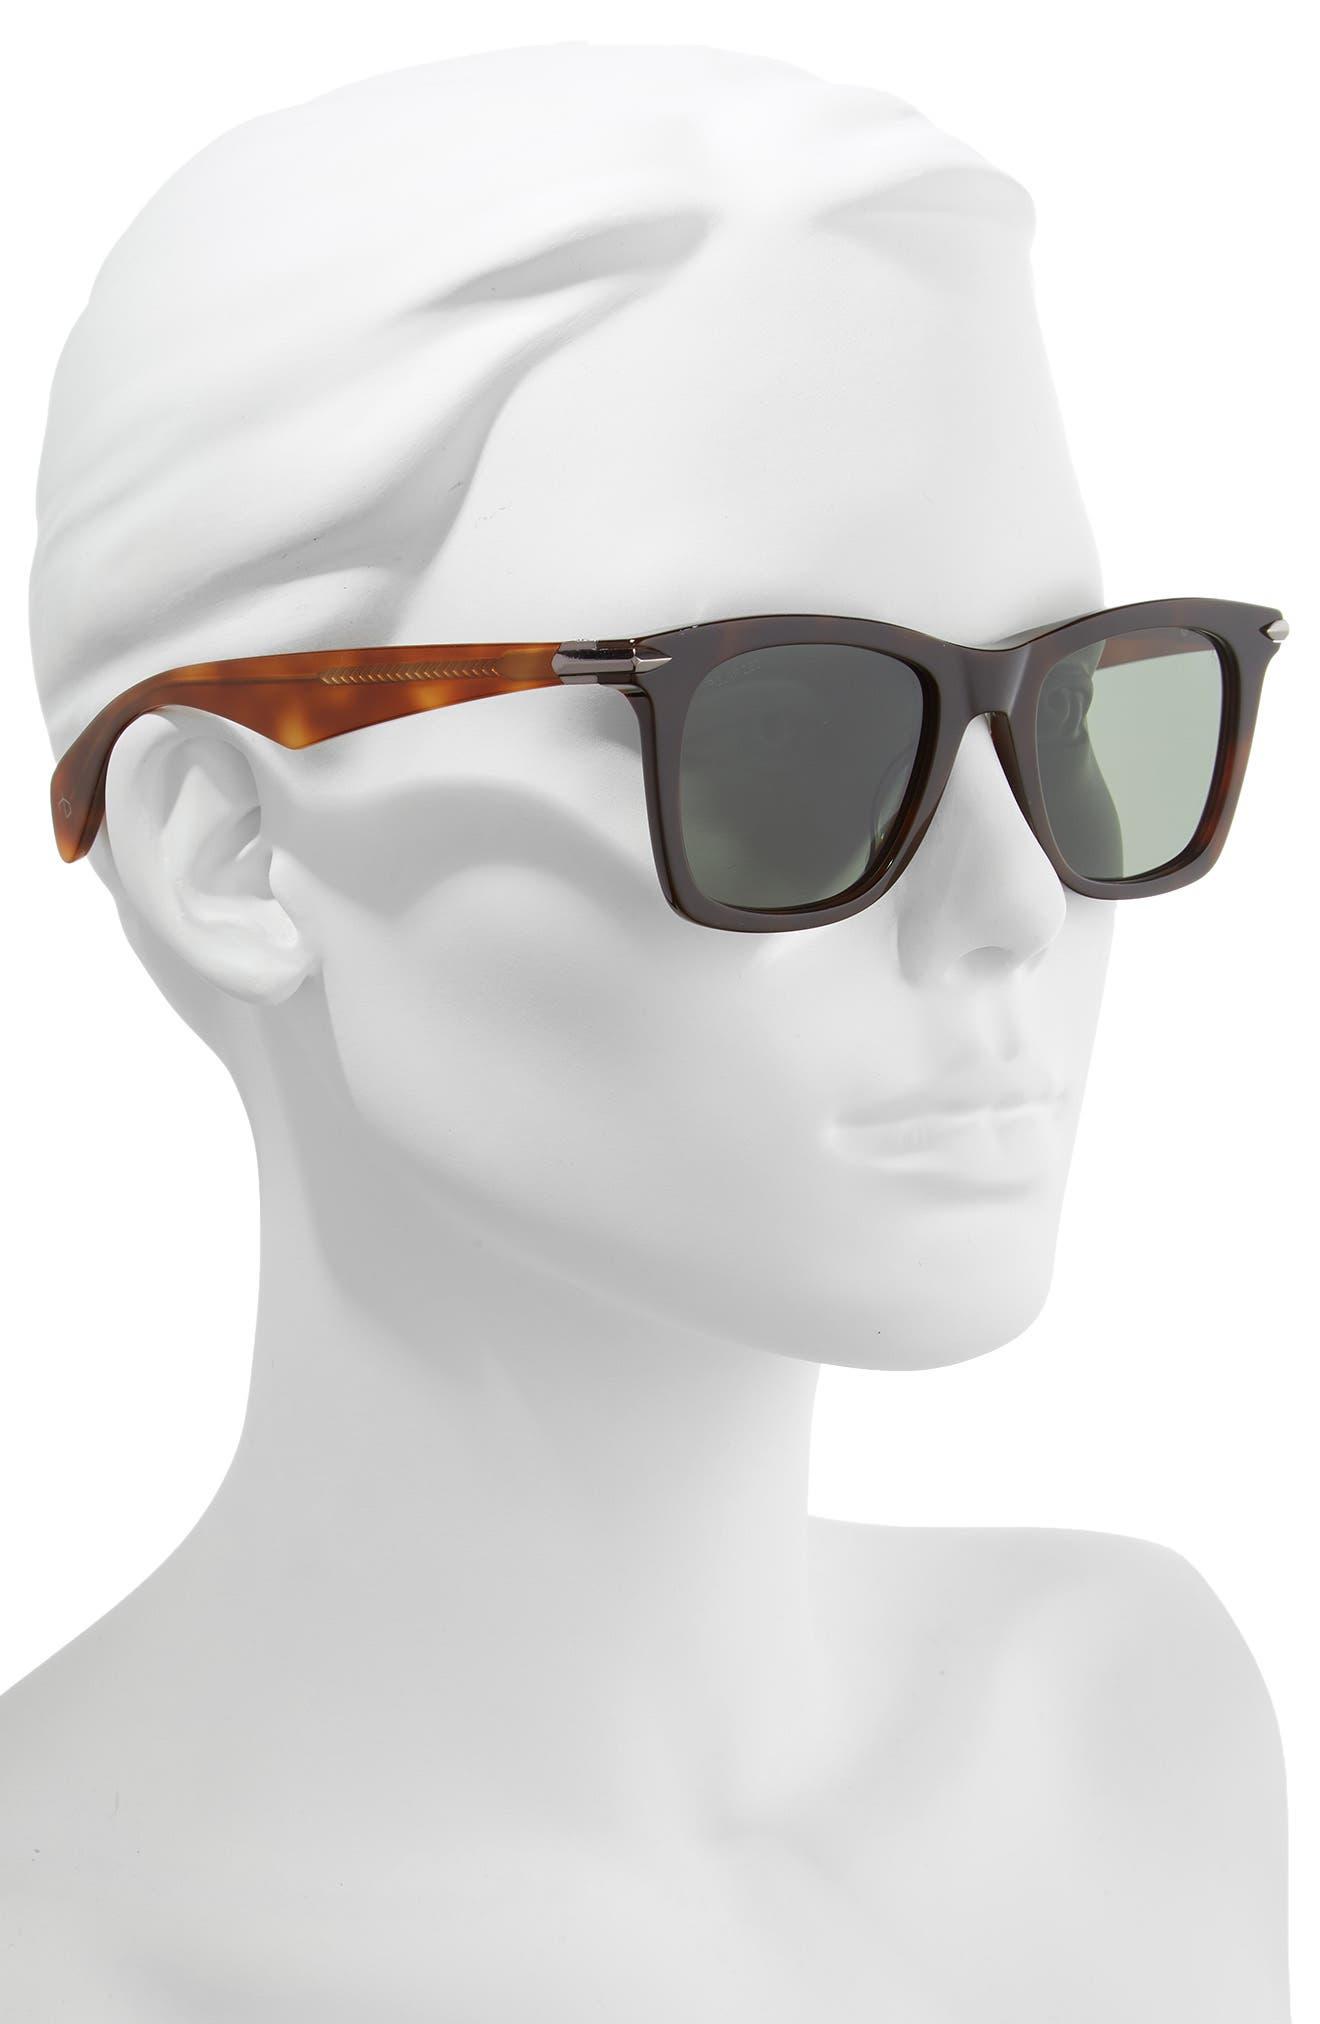 Core 51mm Polarized Sunglasses,                             Alternate thumbnail 2, color,                             DARK/ HAVANA